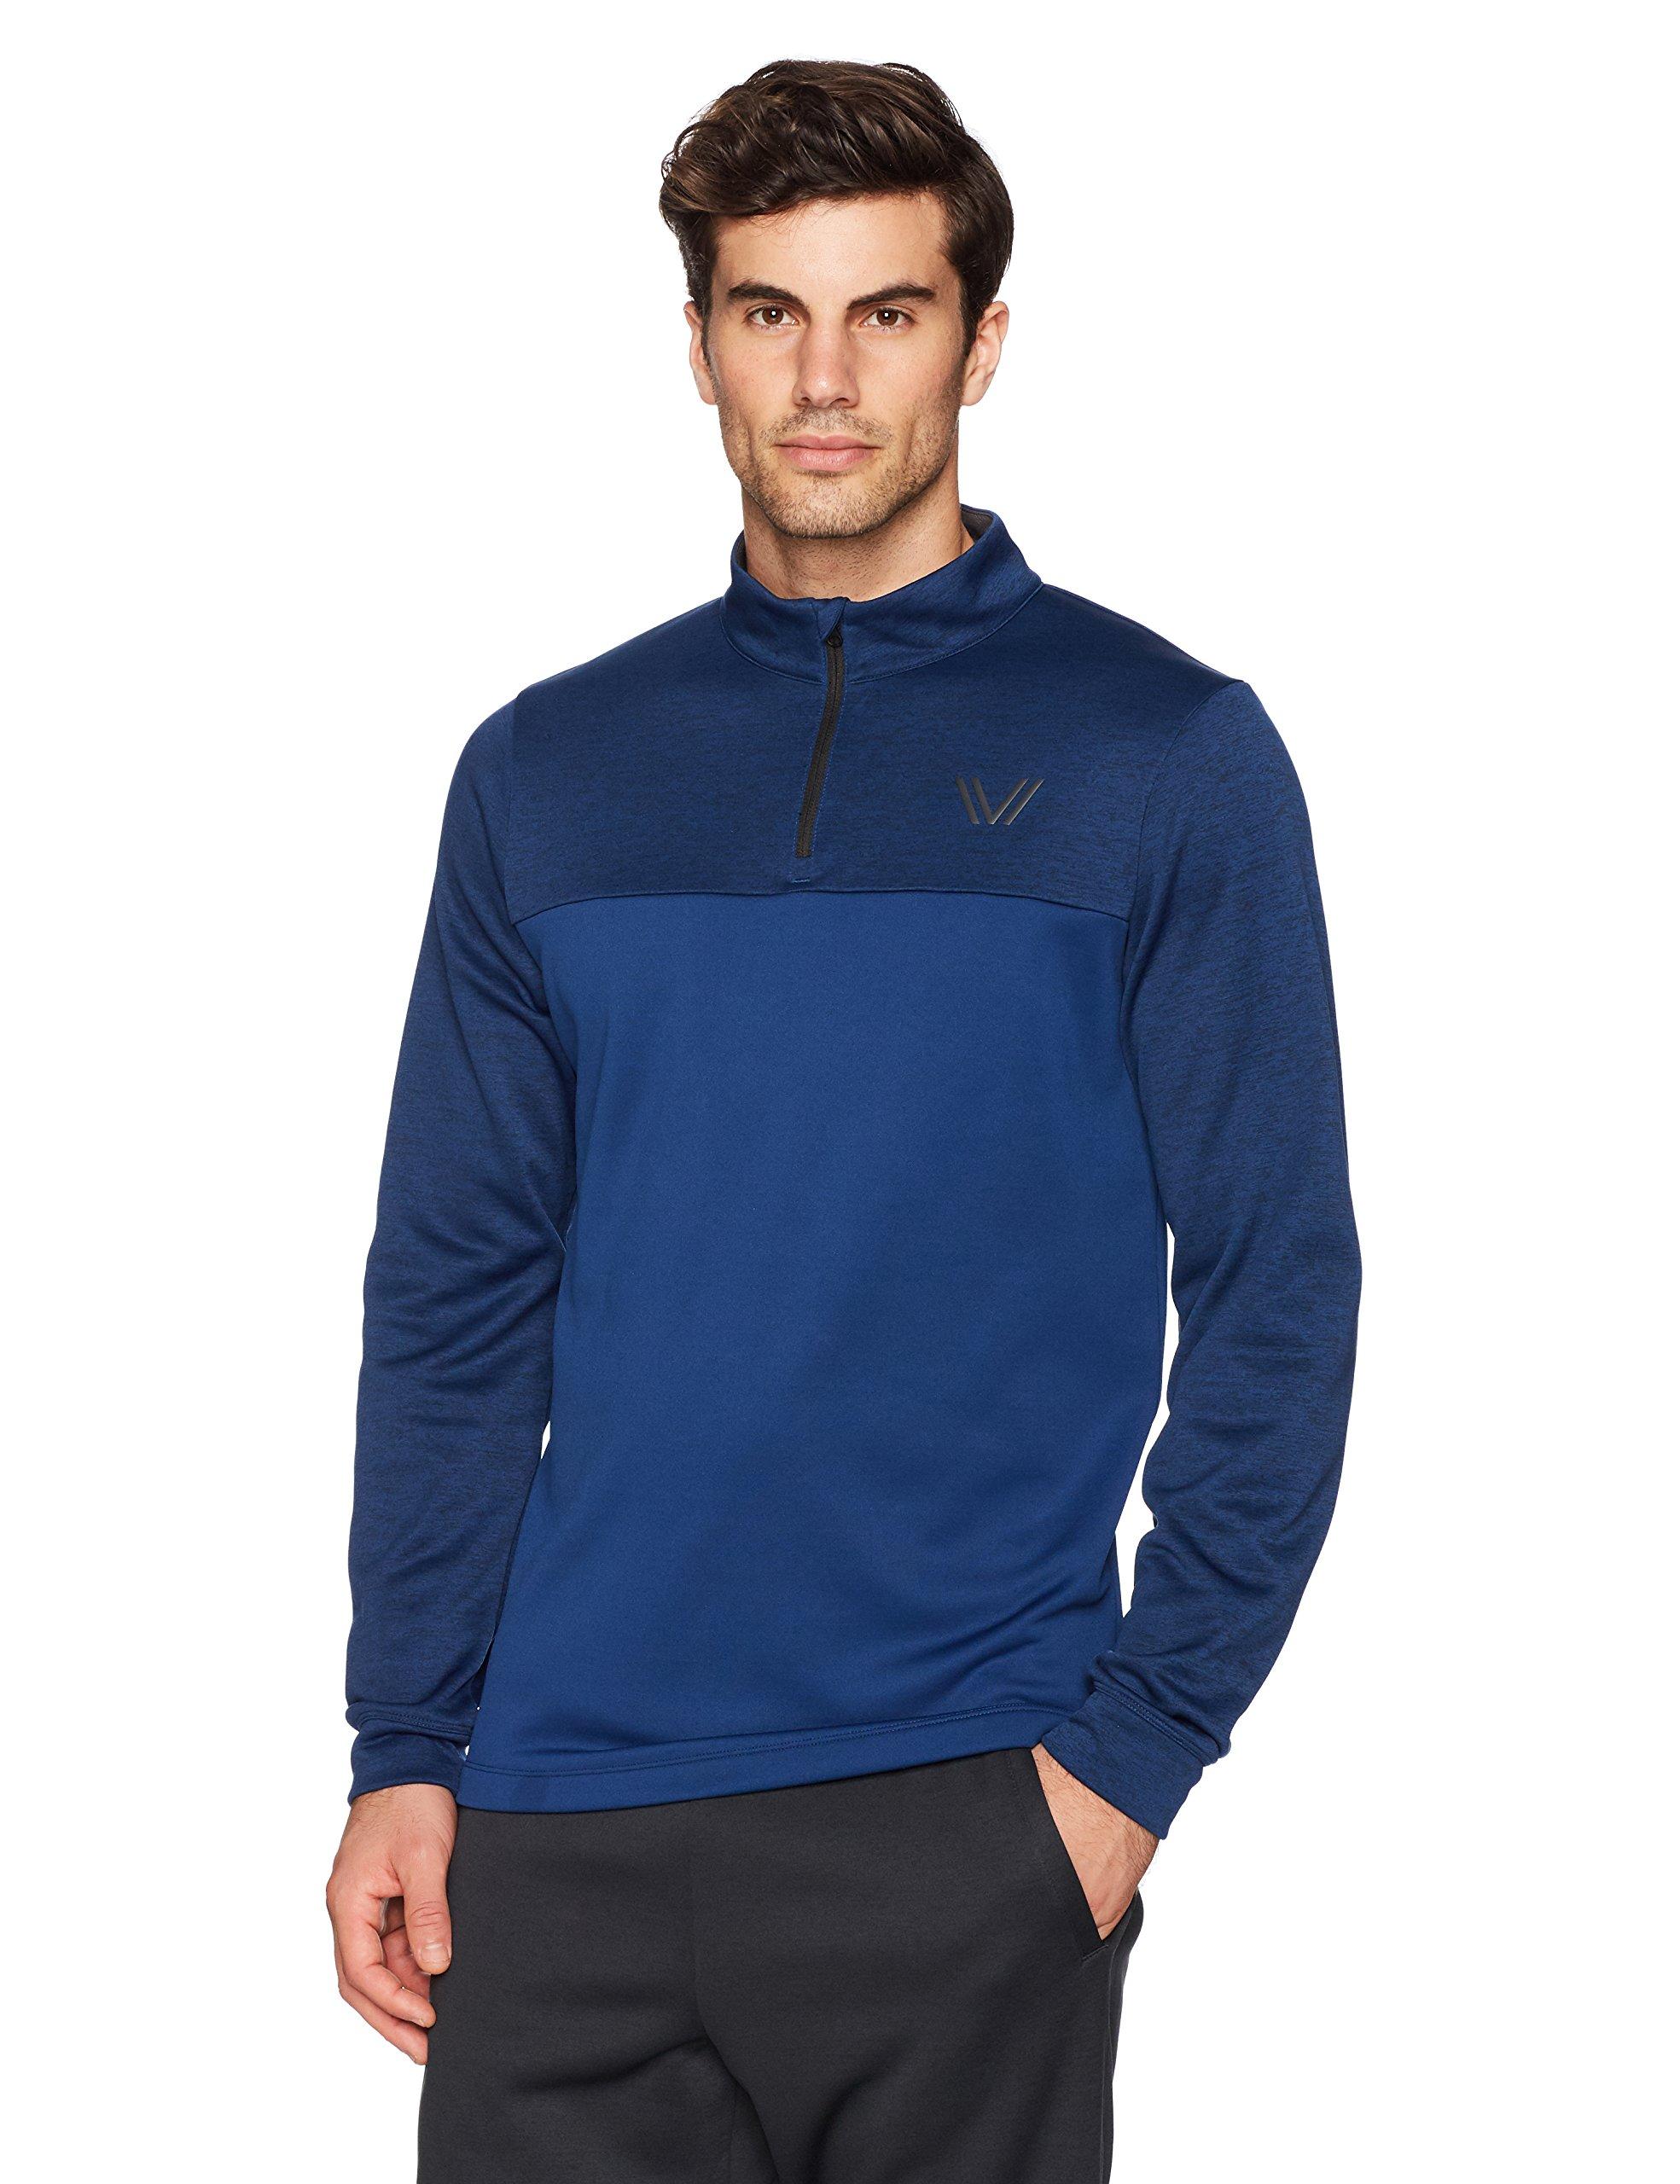 Peak Velocity Men's Quantum Fleece 1/4 Zip Athletic-Fit Top, Victory Blue Heather/Victory Blue, Medium